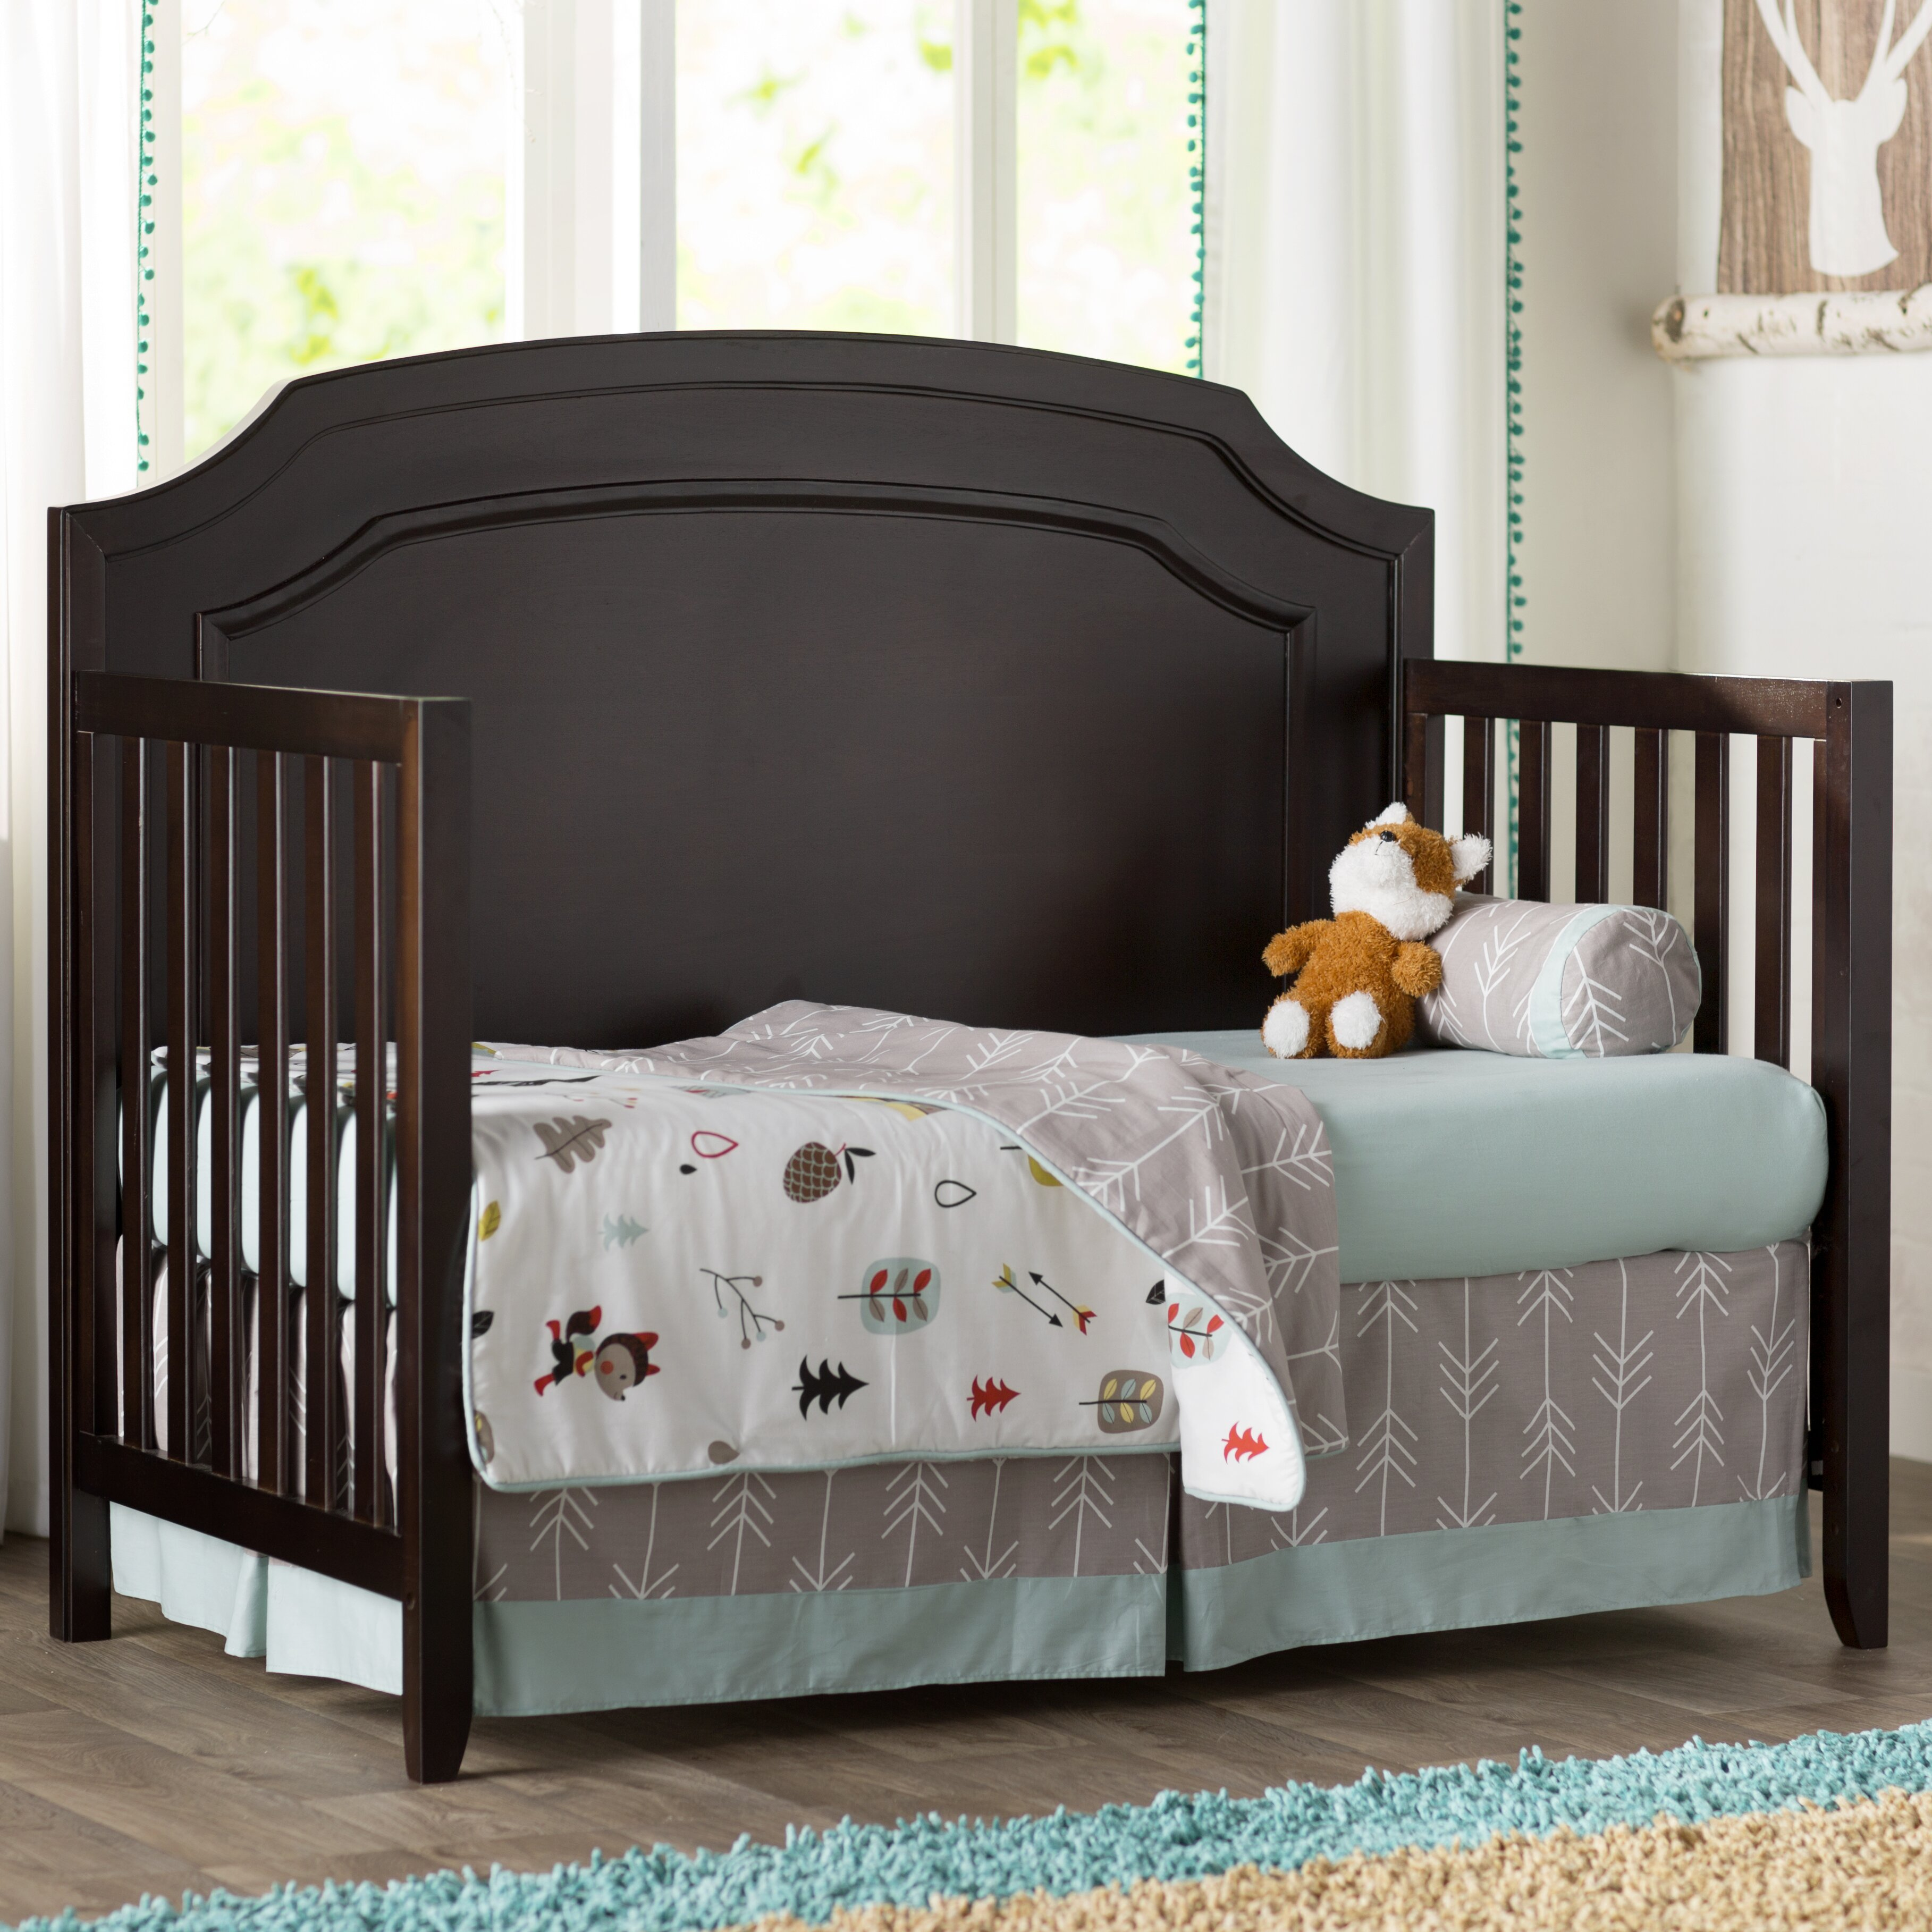 Emma iron crib for sale - Viv Rae Trade Emma 4 In 1 Convertible Crib